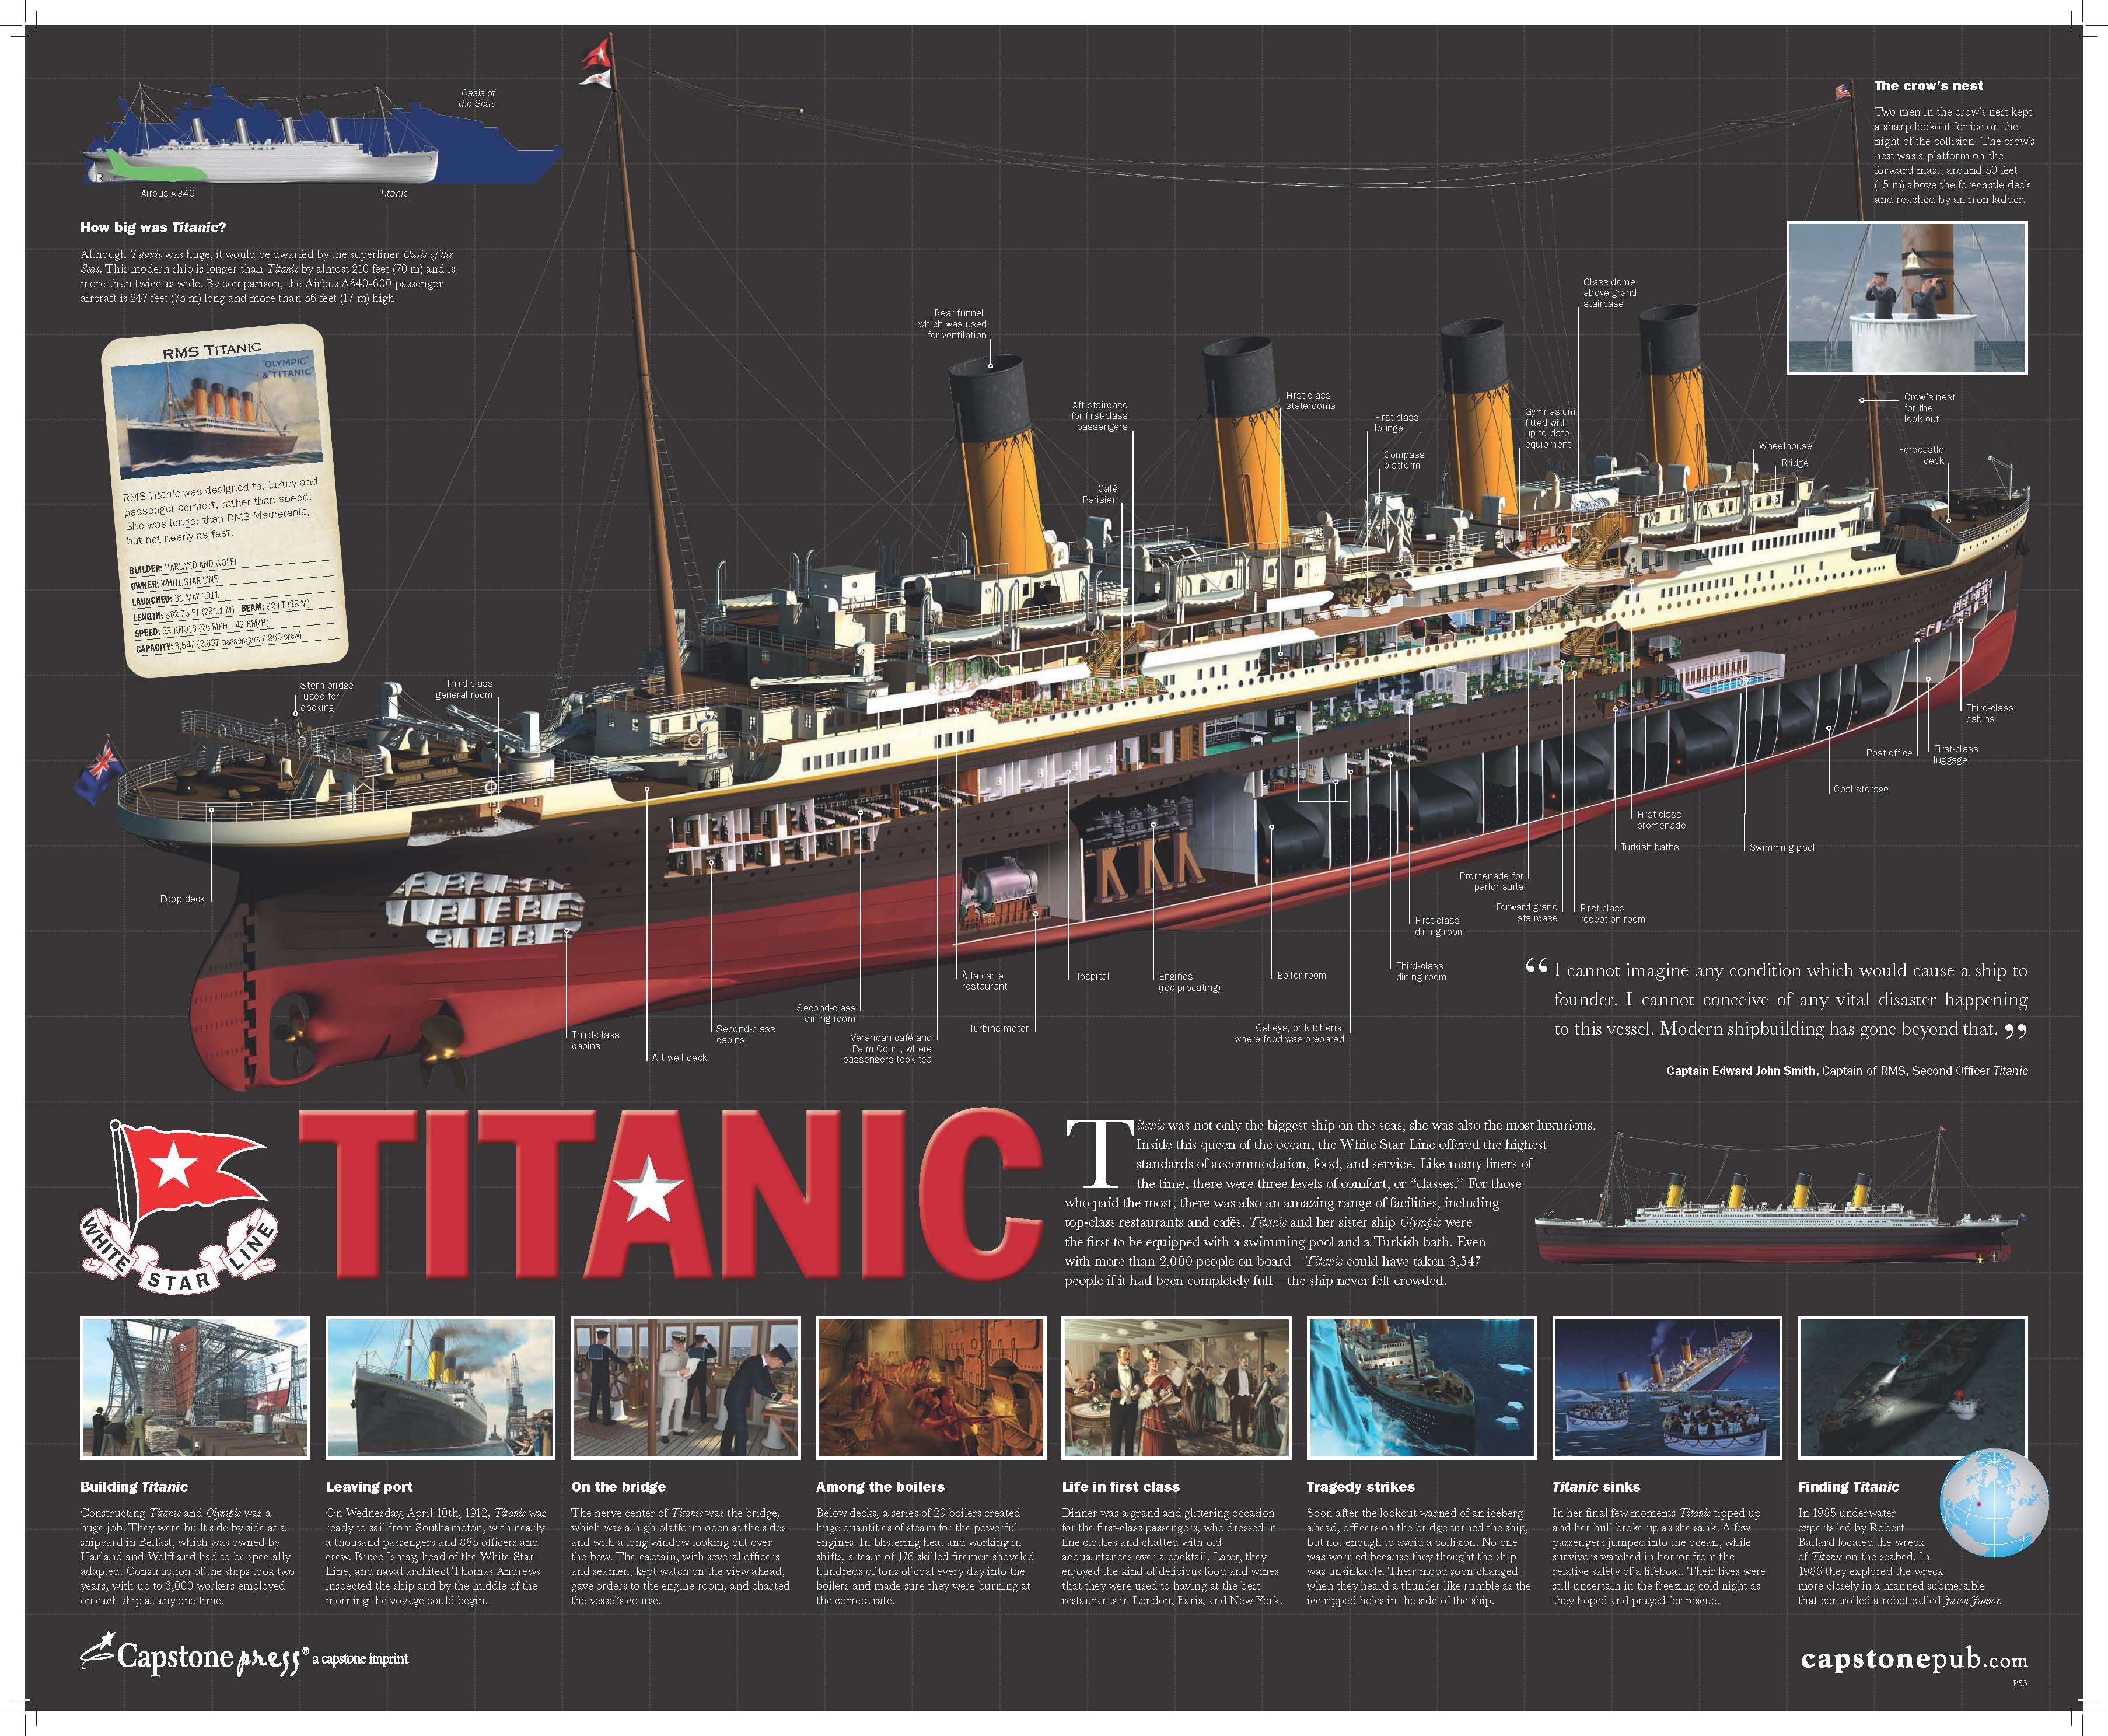 Titanic Sinking Diagram